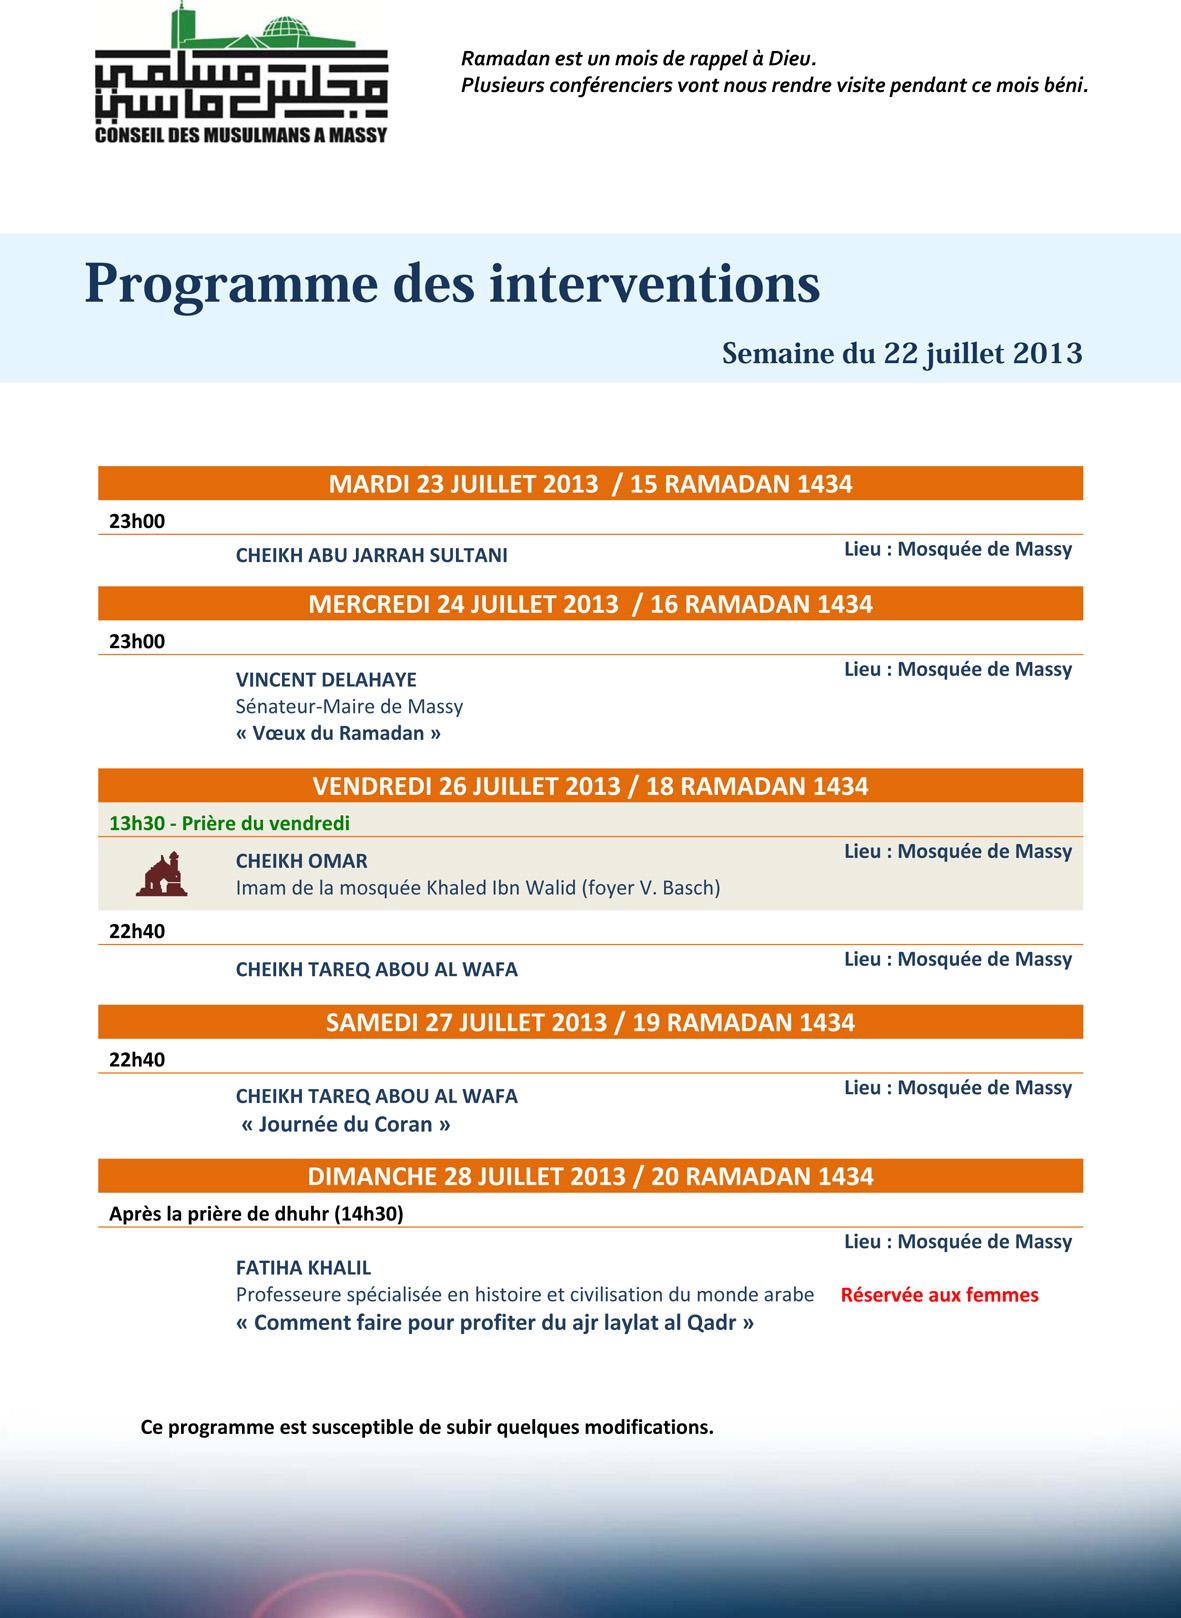 Programme des interventions - Semaine du 22 juillet 2013